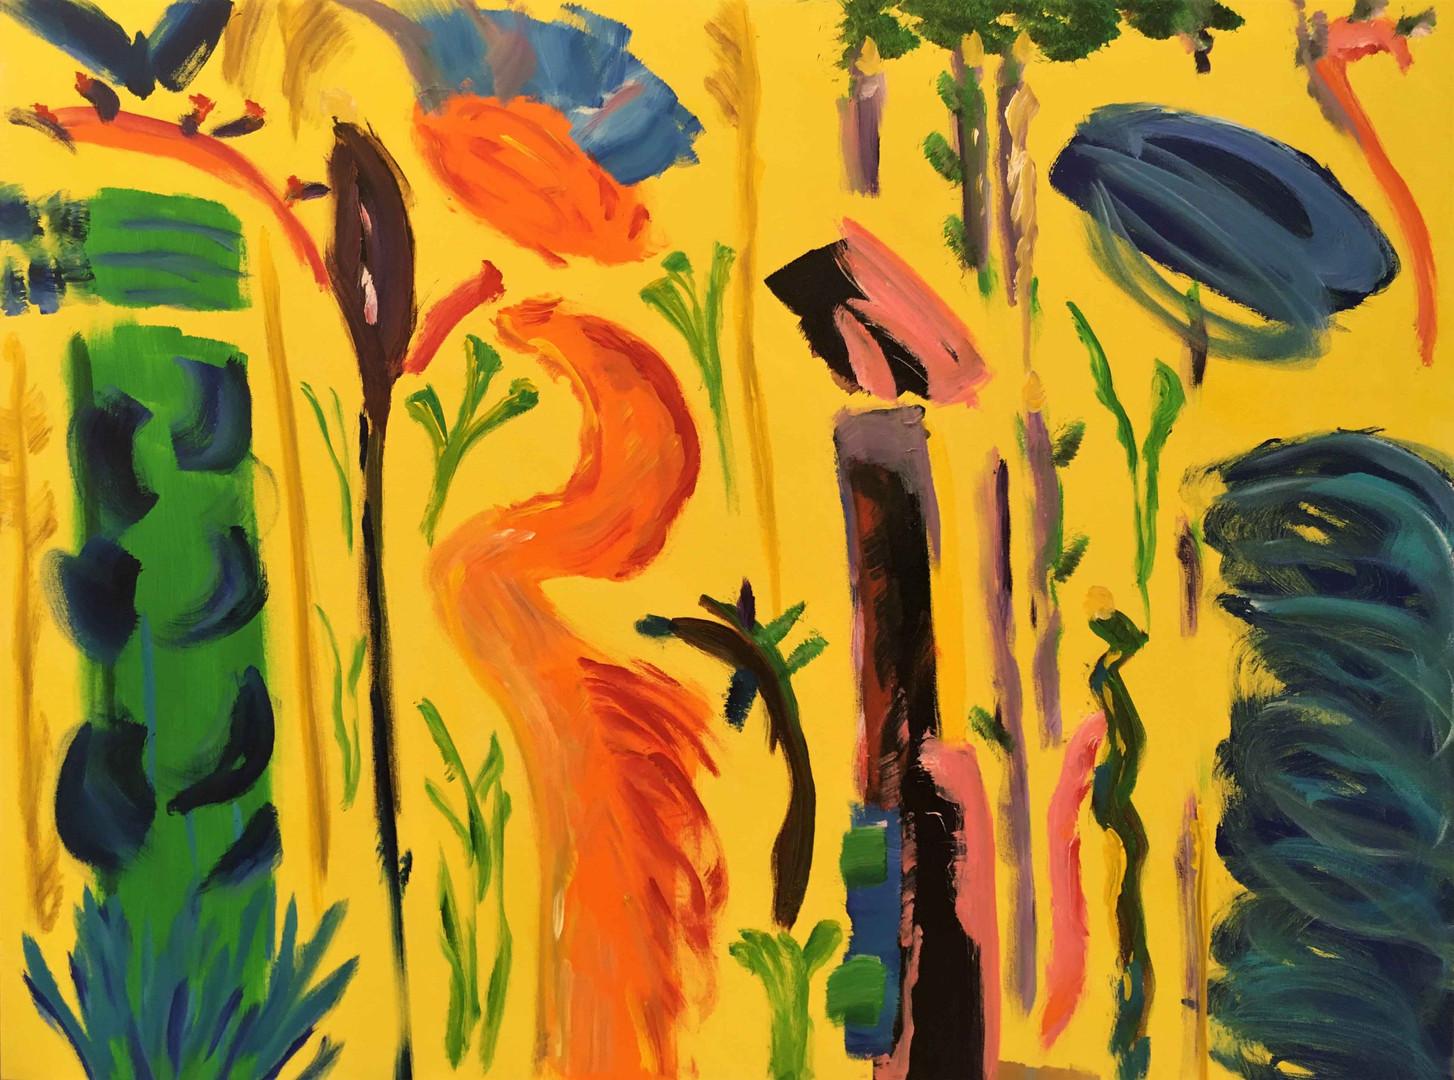 Les Demoiselles in the Jungle